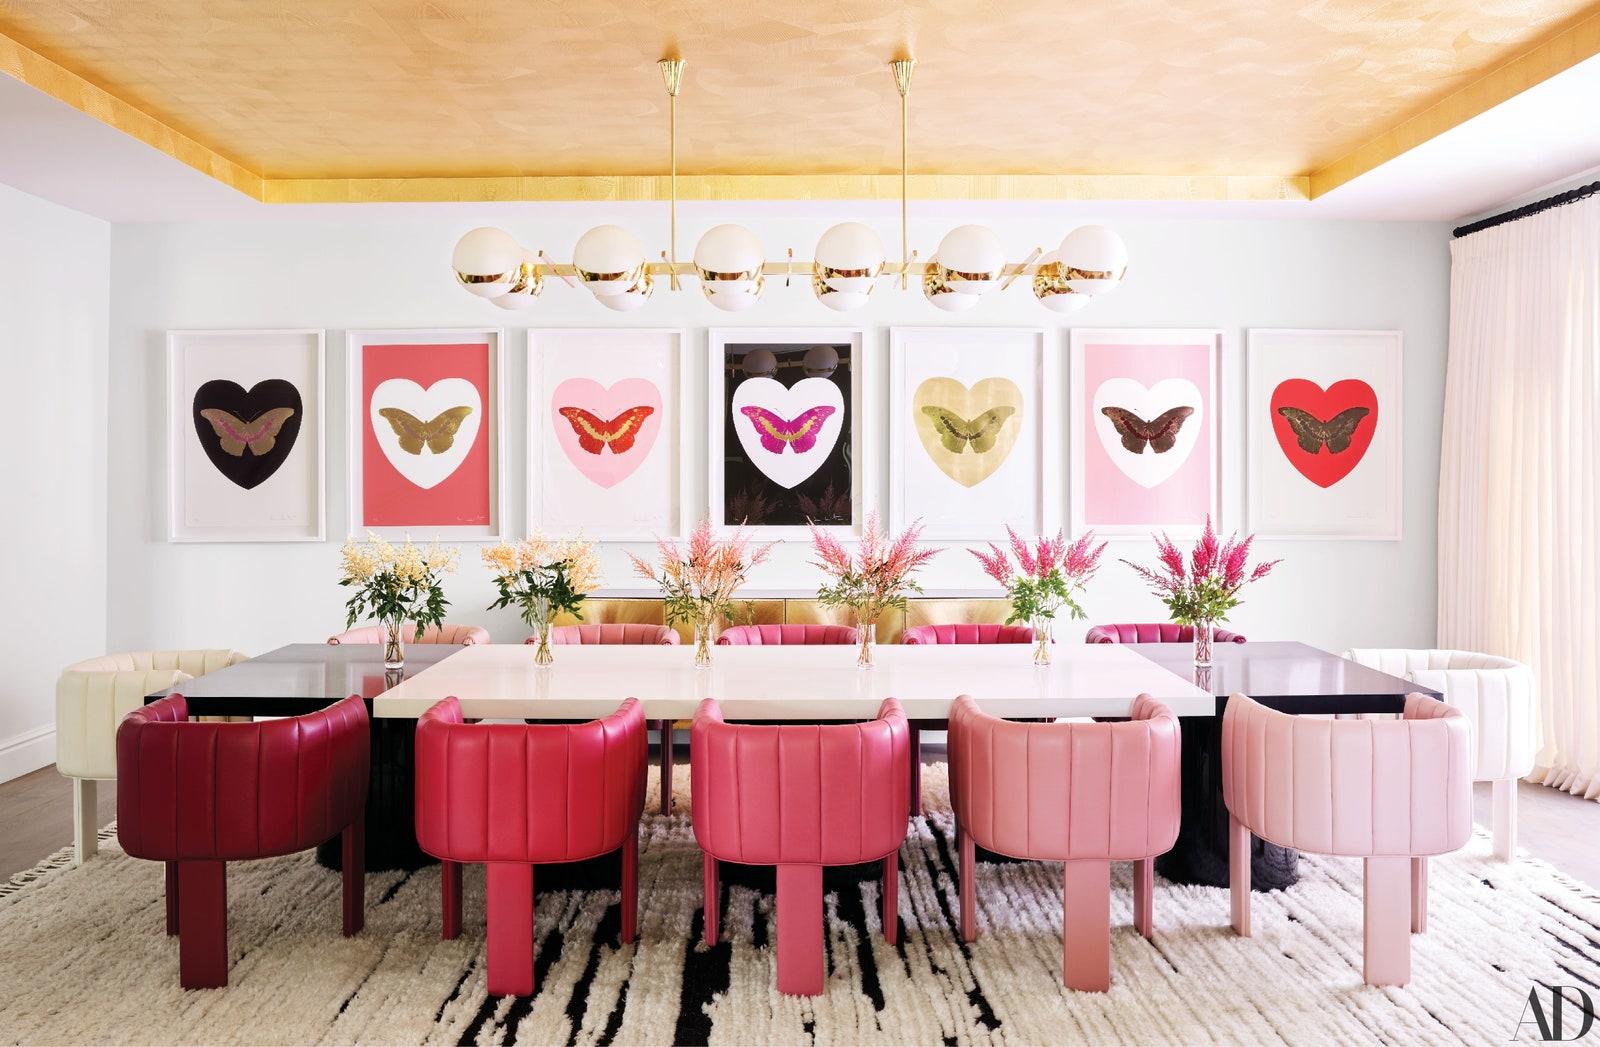 Explore Chez Kylie Jenner, Designed by Martyn Lawrence Bullard